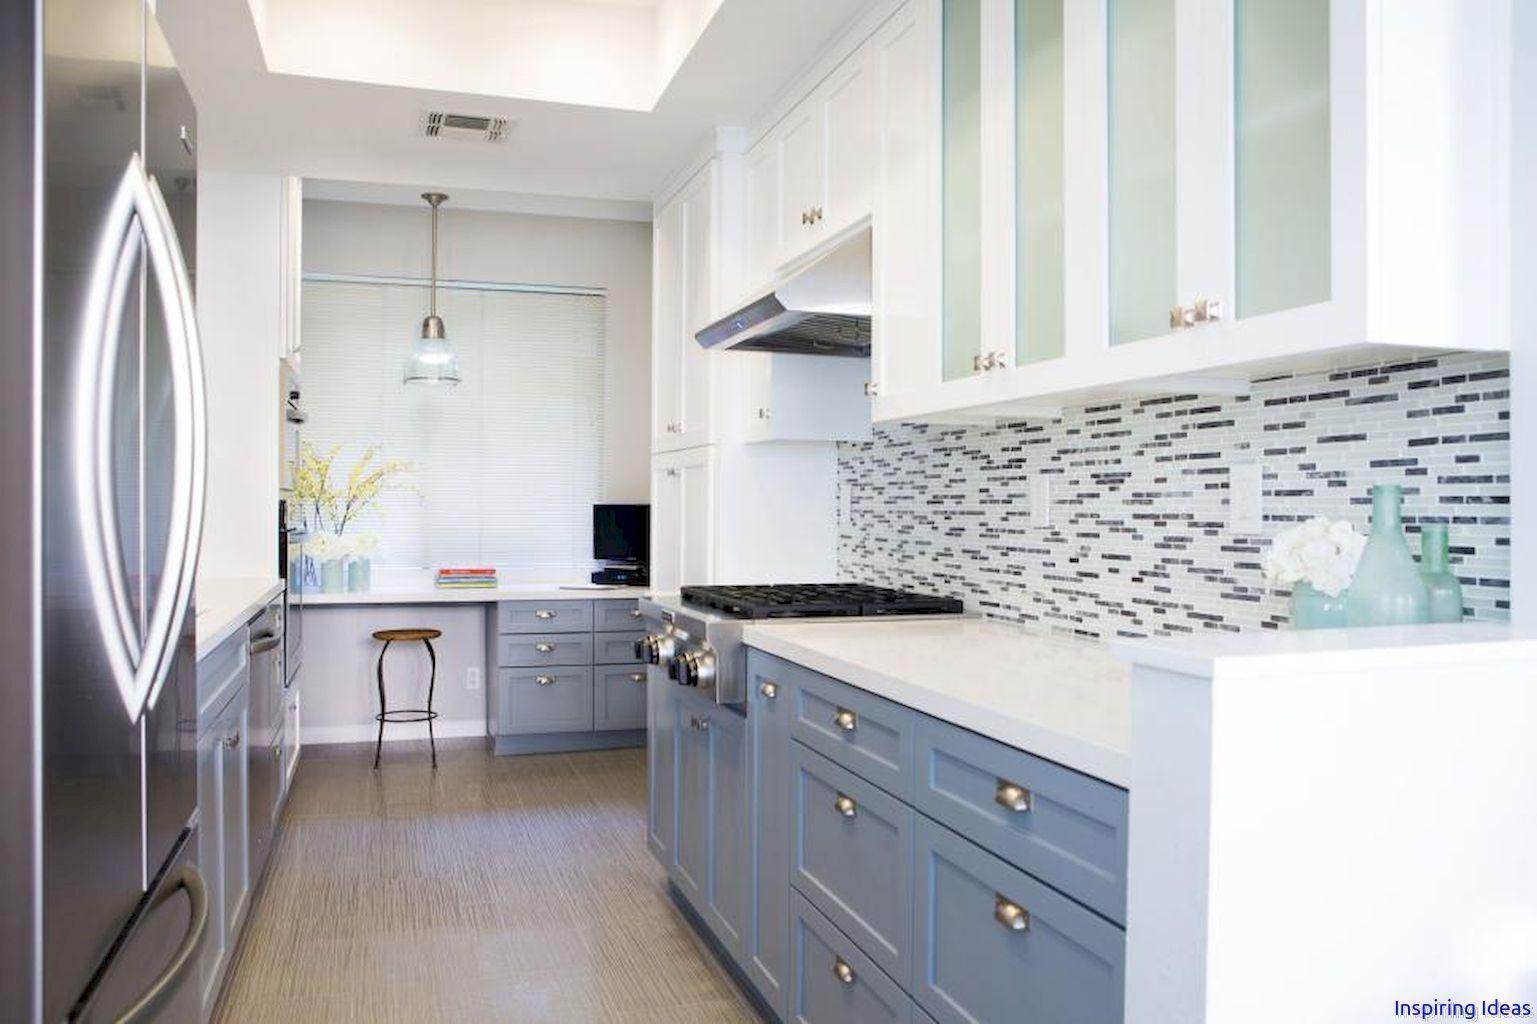 Cool stunning midcentury modern kitchen backsplash design ideas